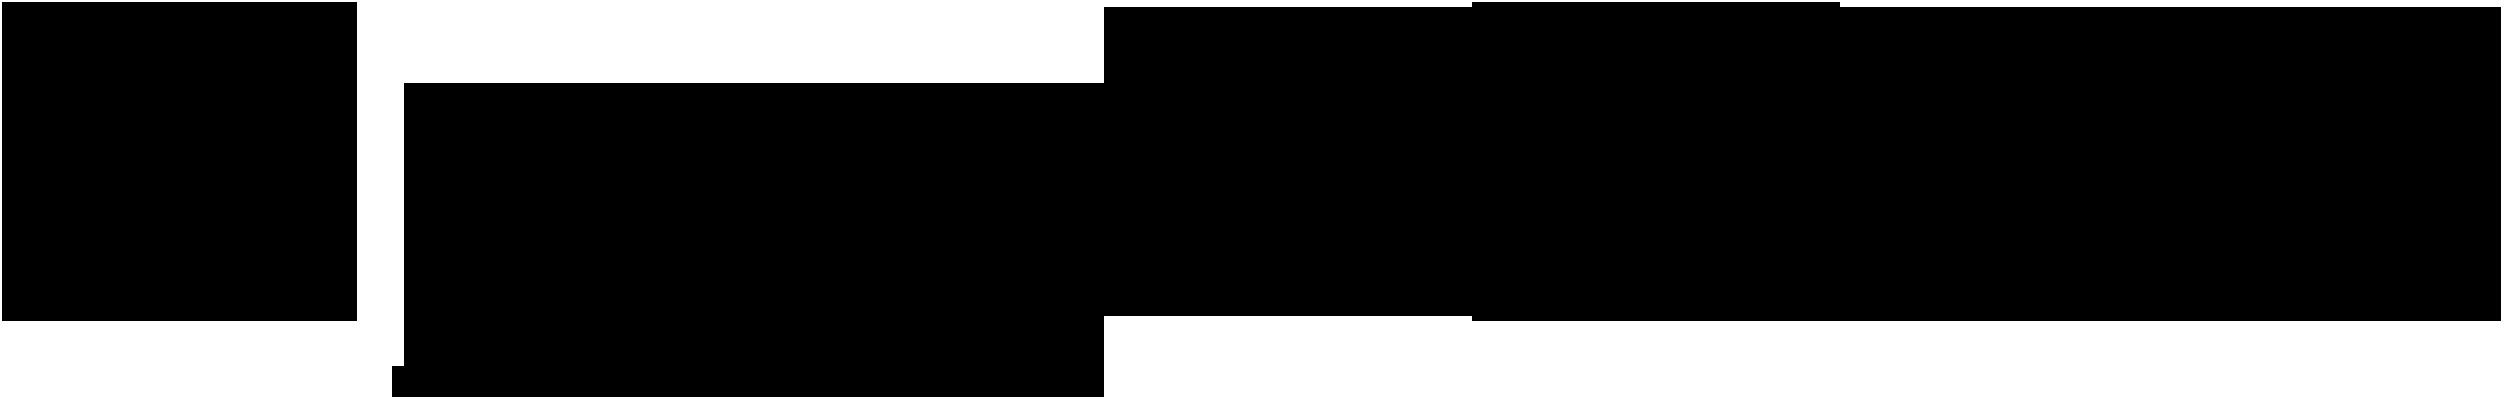 SiegelGale logo web